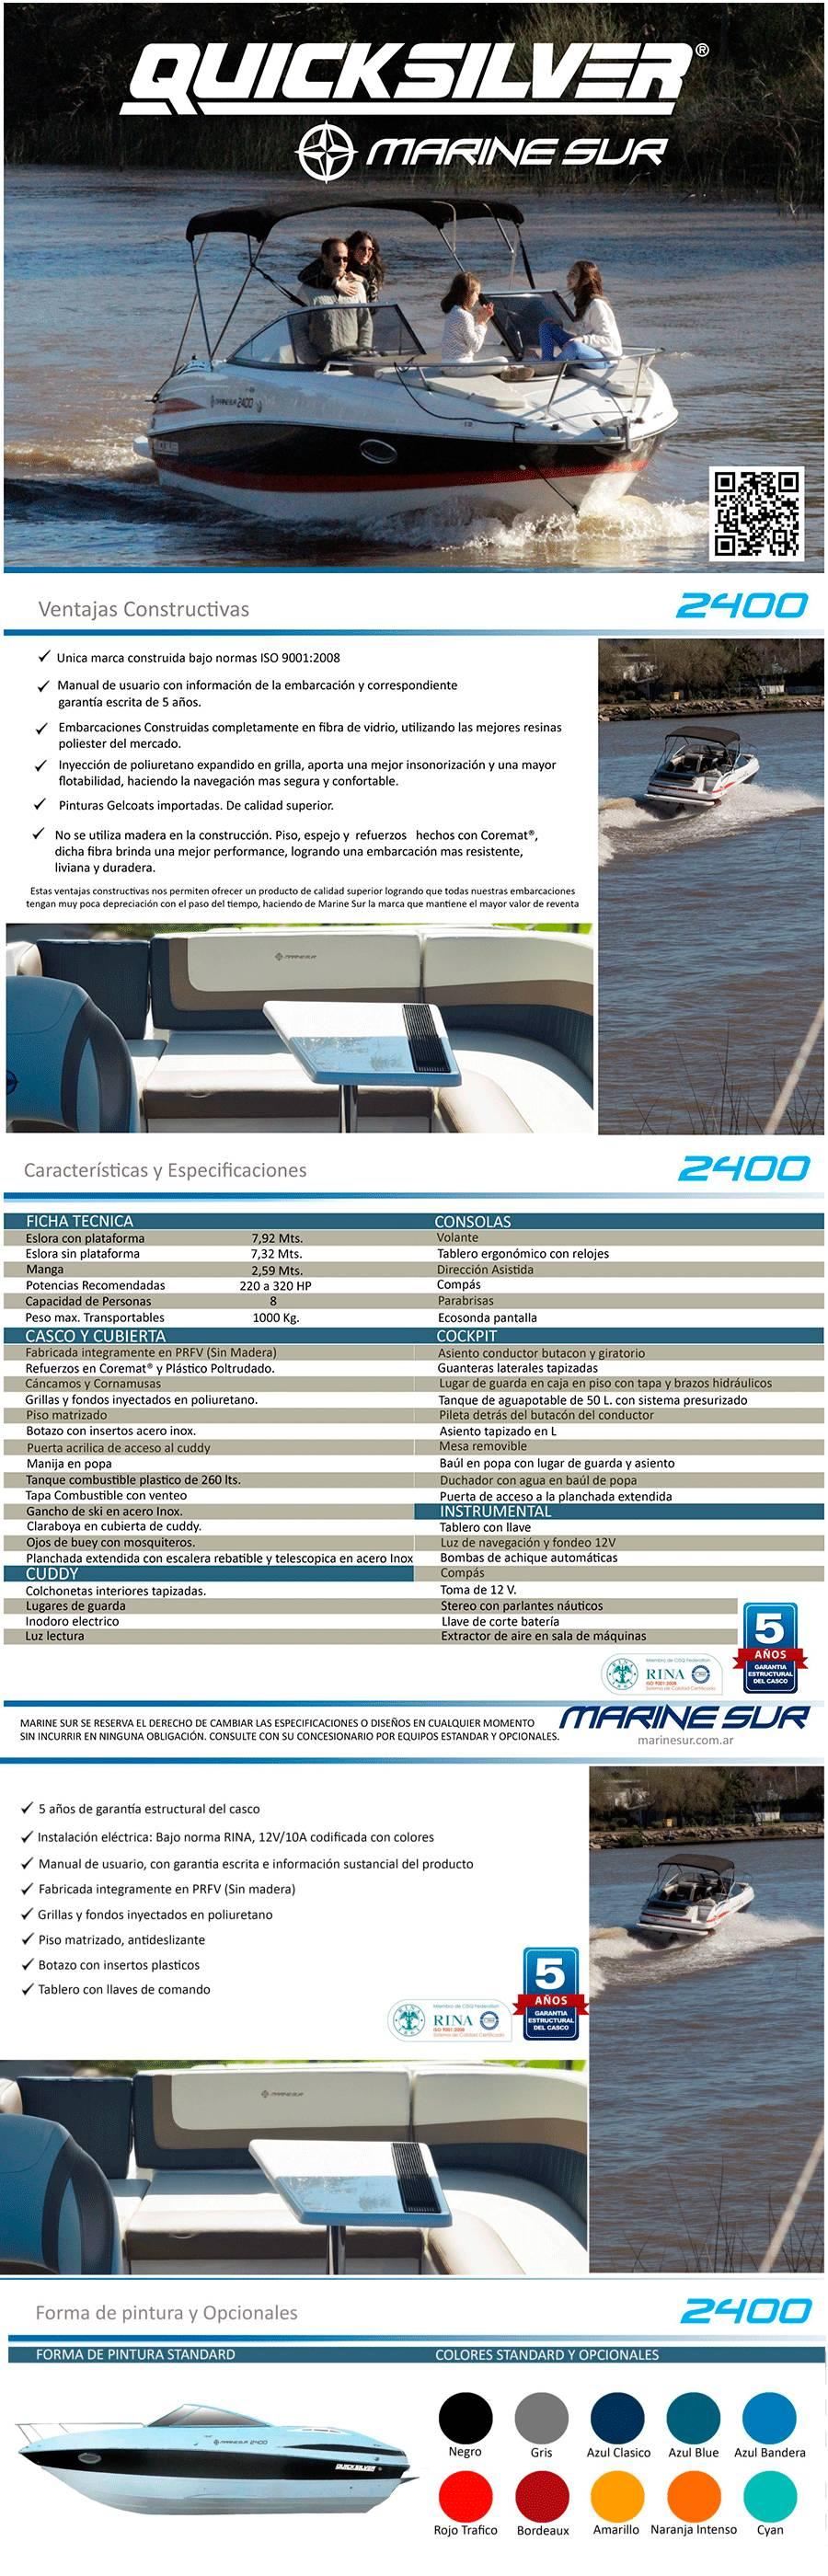 Lanchas bermuda. Lanchas Arco Iris. Rio. Wakeboard